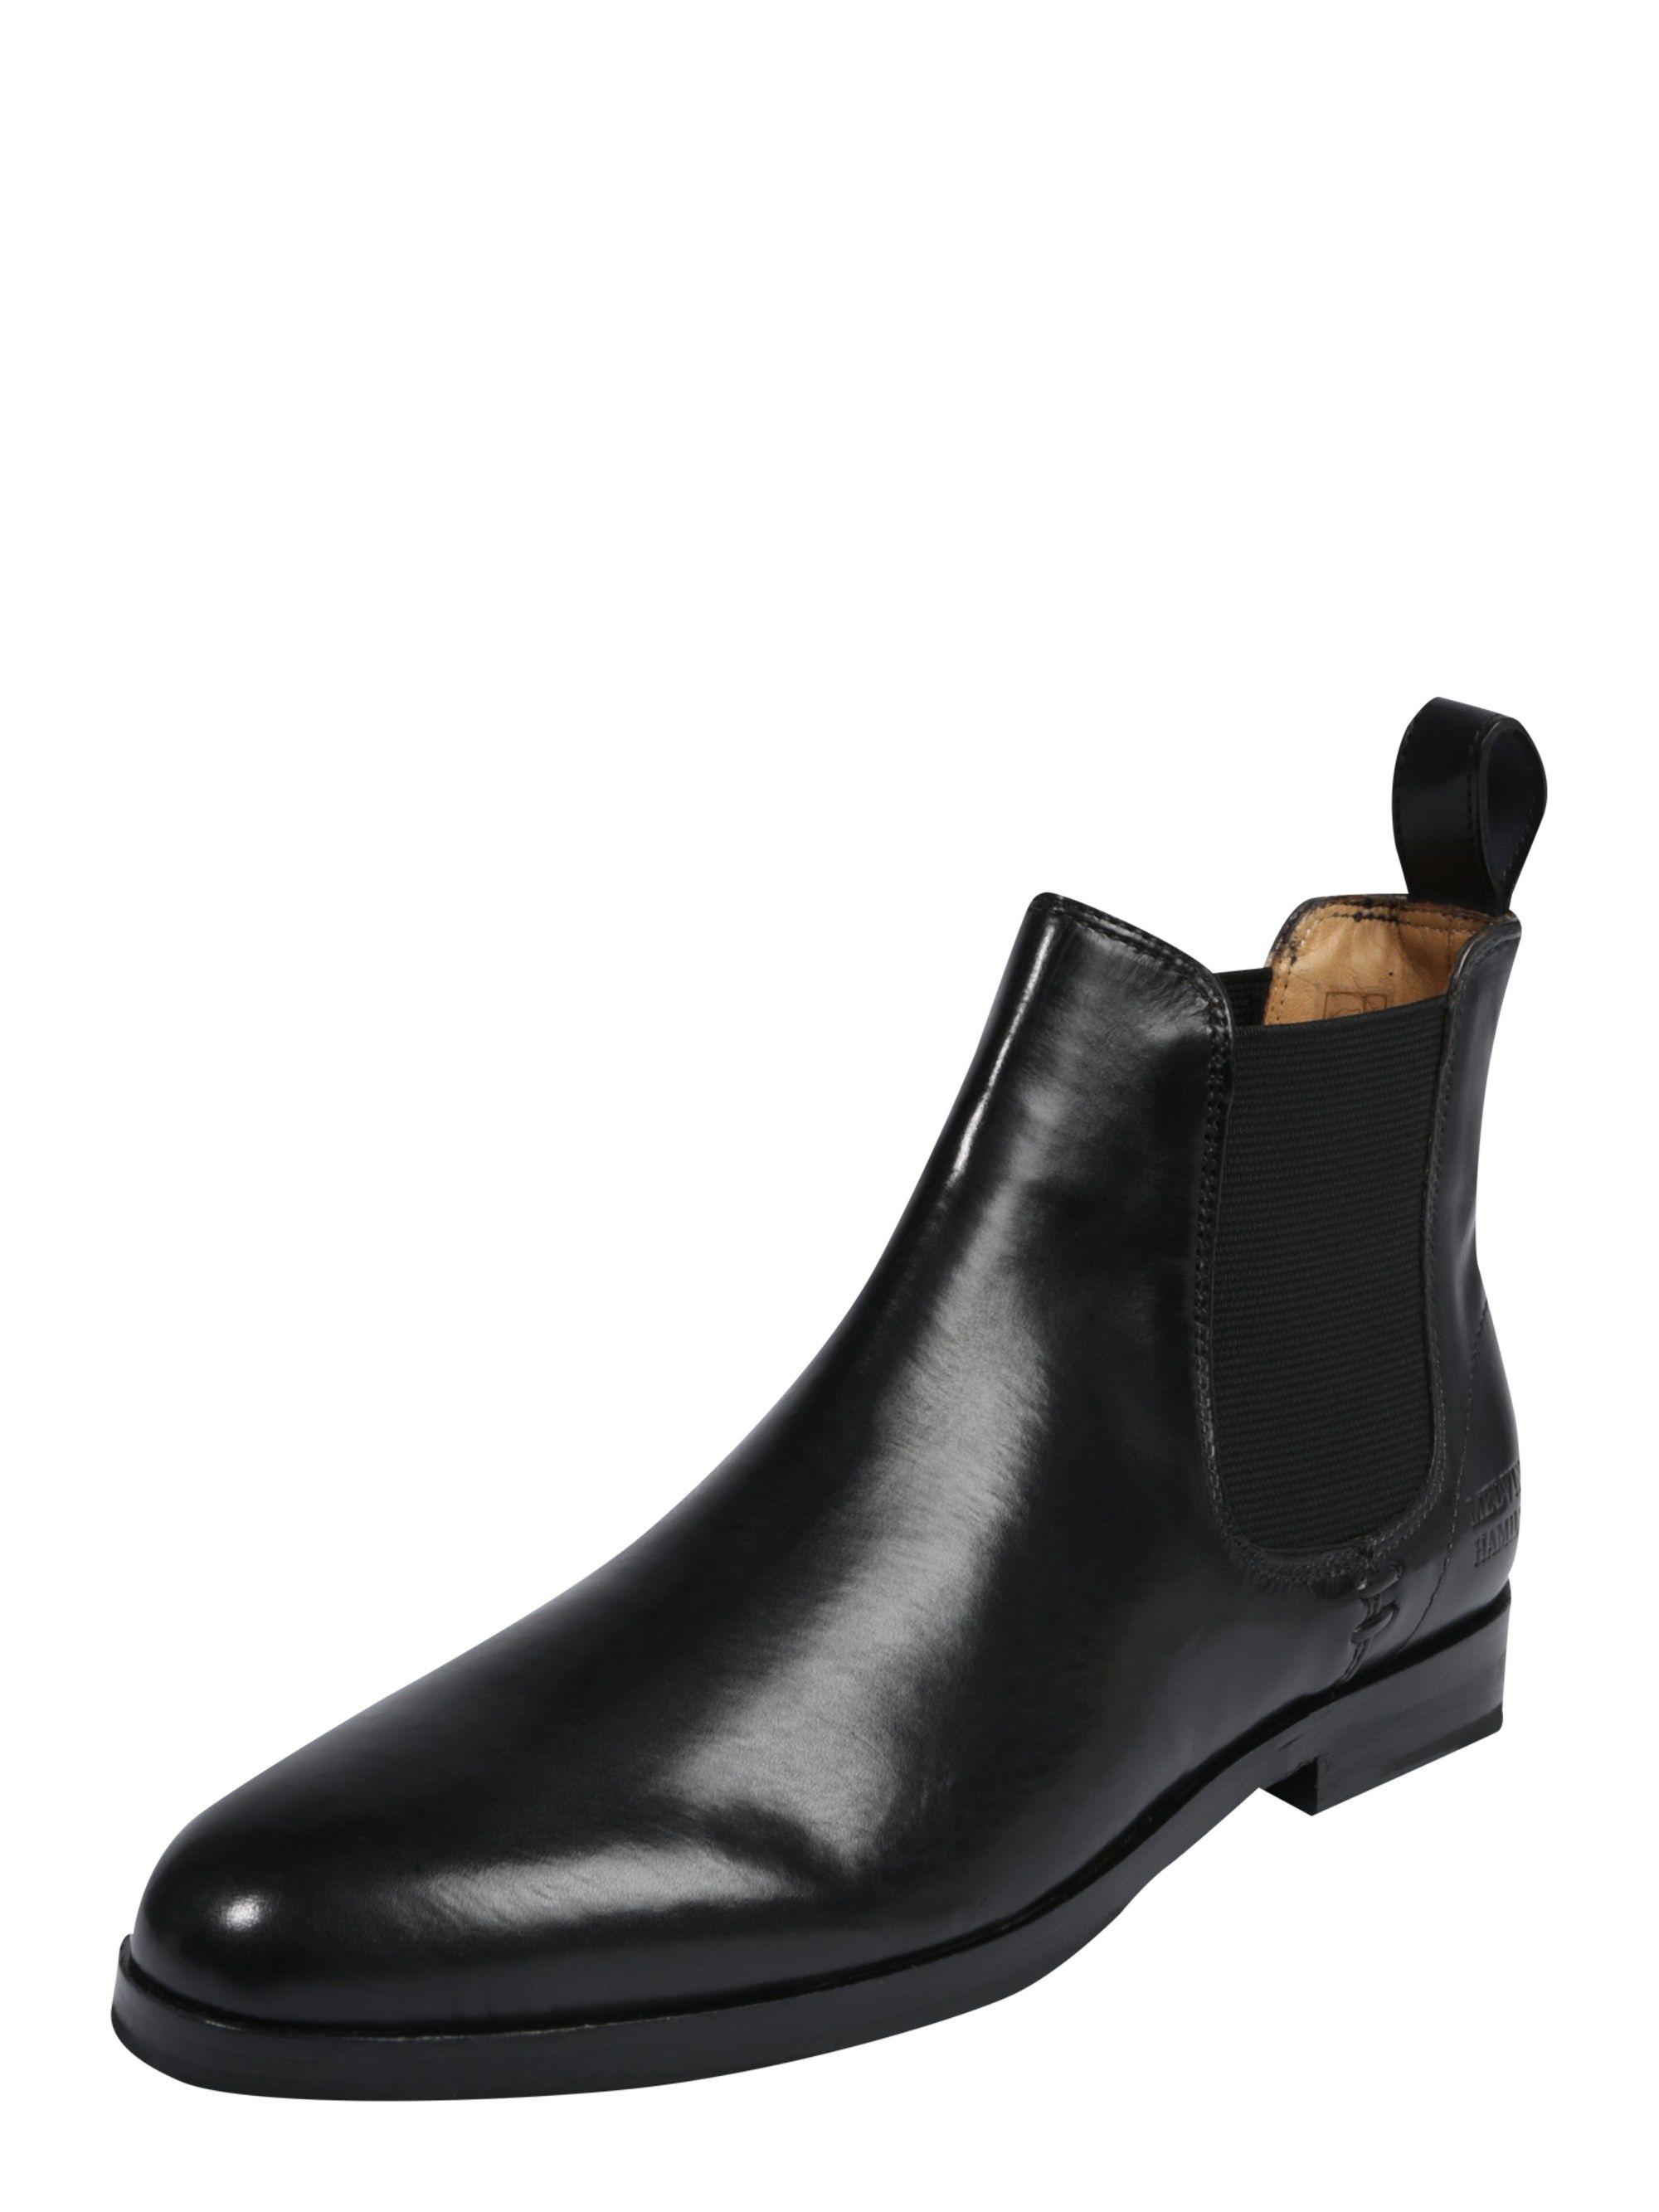 4f6271971394c1 AboutYou  MELVINHAMILTON  Ankle Boots  Boots  Schuhe  Stiefel  Damen ...